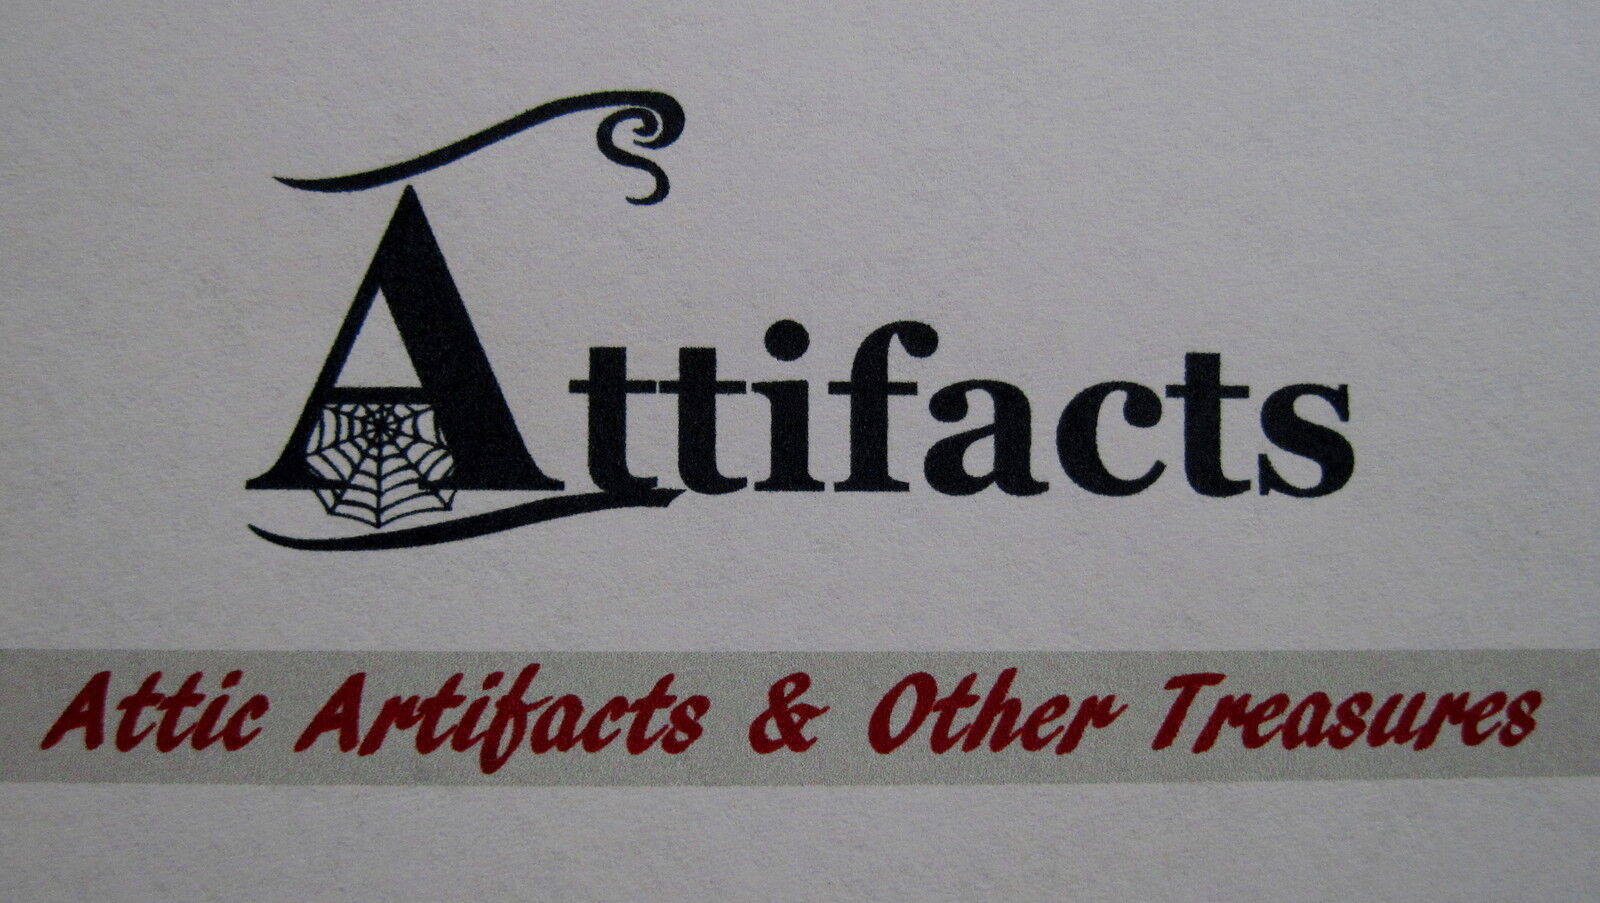 Attifacts